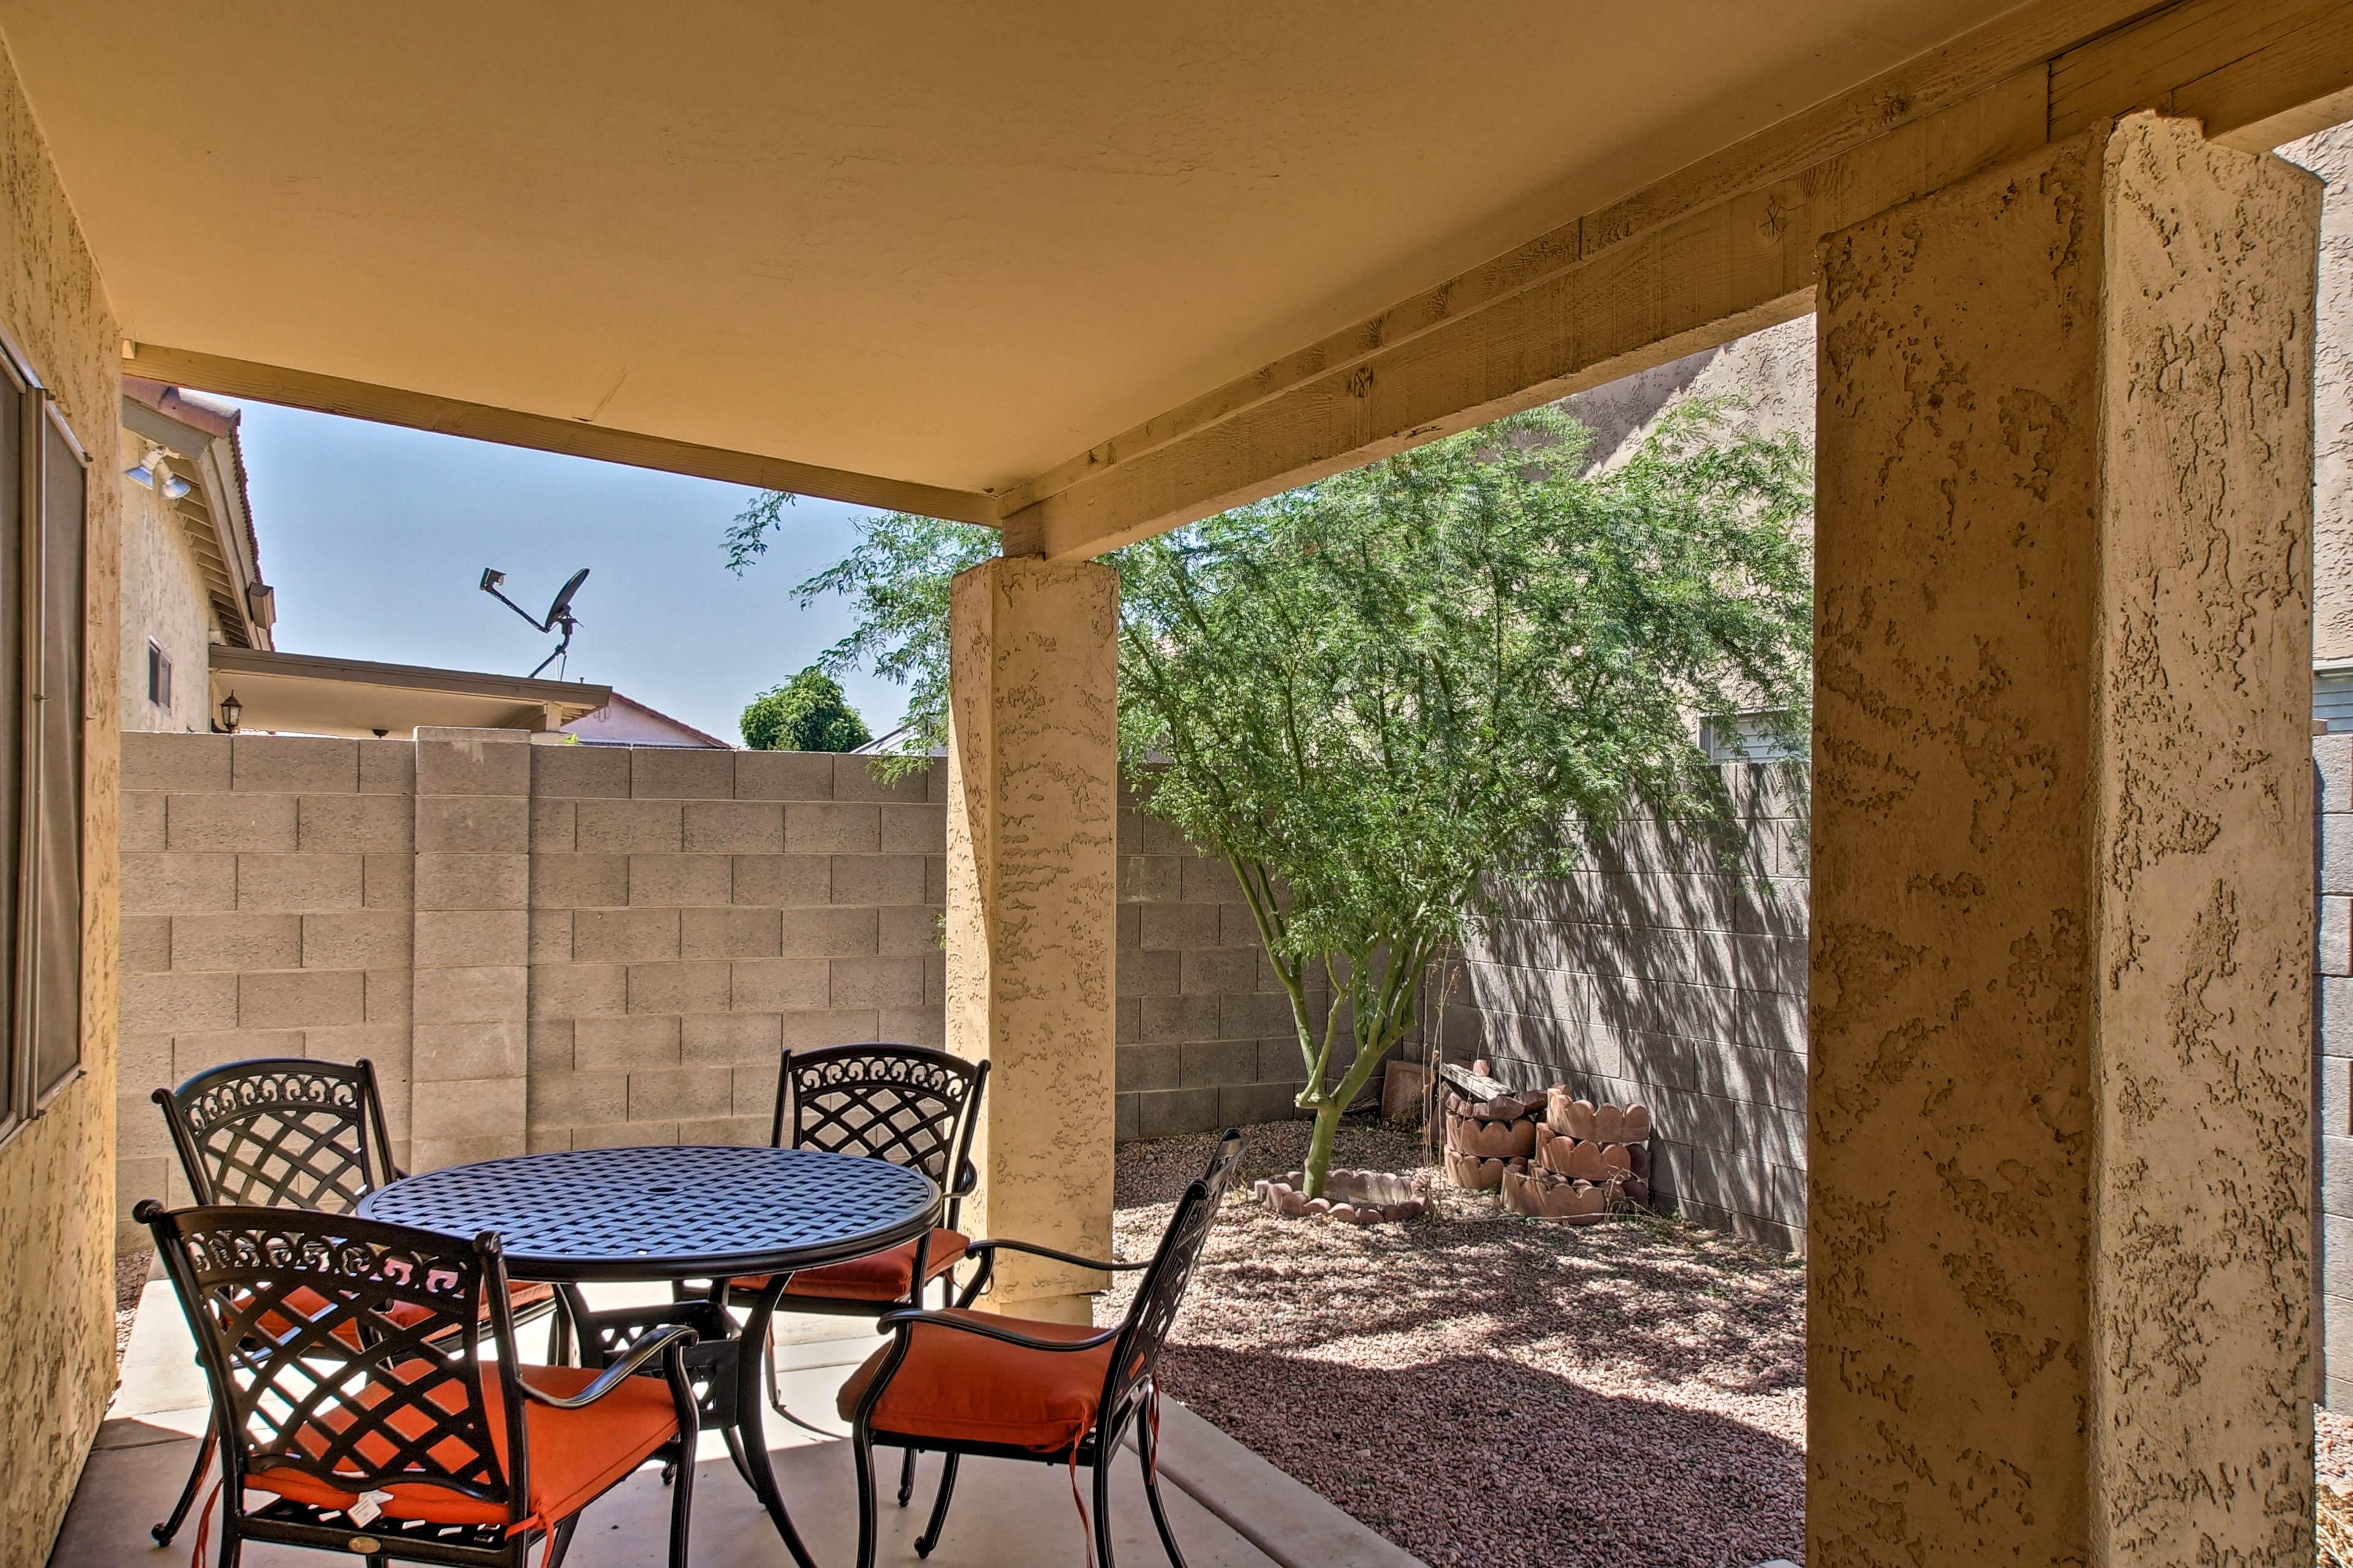 Enjoy dining al fresco on the covered back patio!